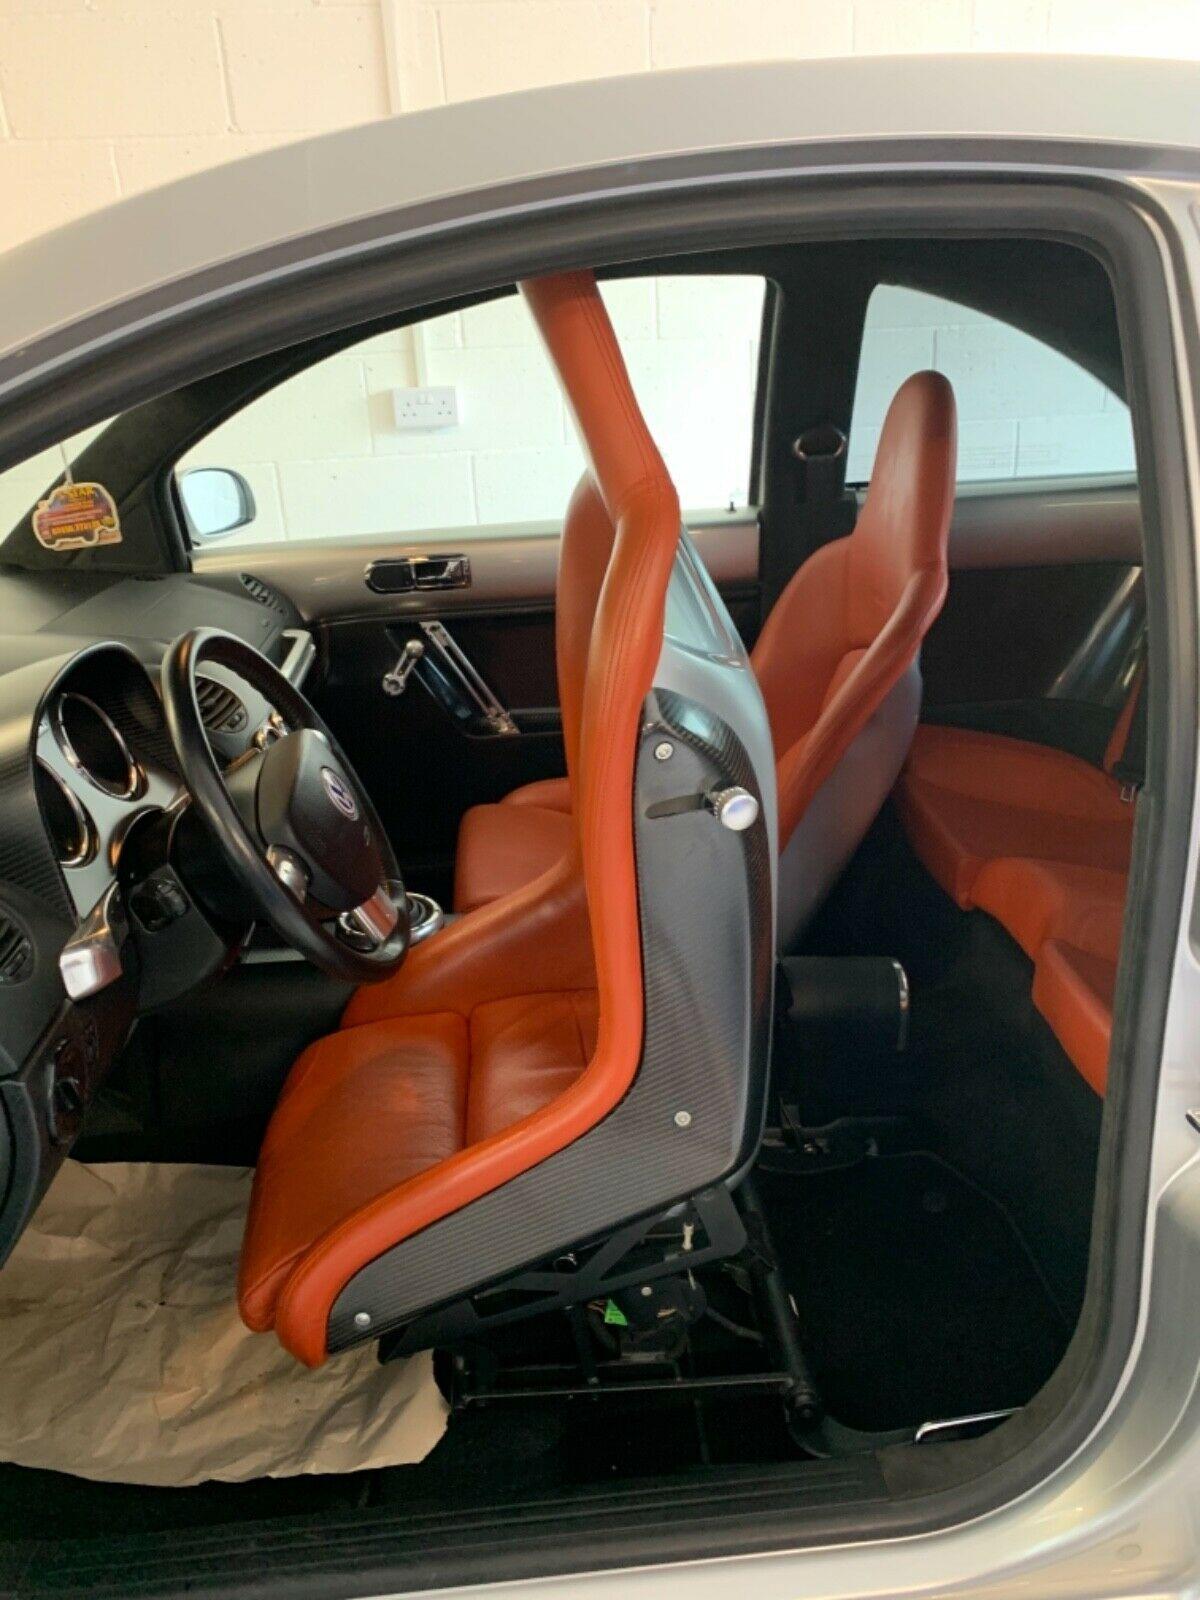 Volkswagen-Beetle-RSi-for-sale-7